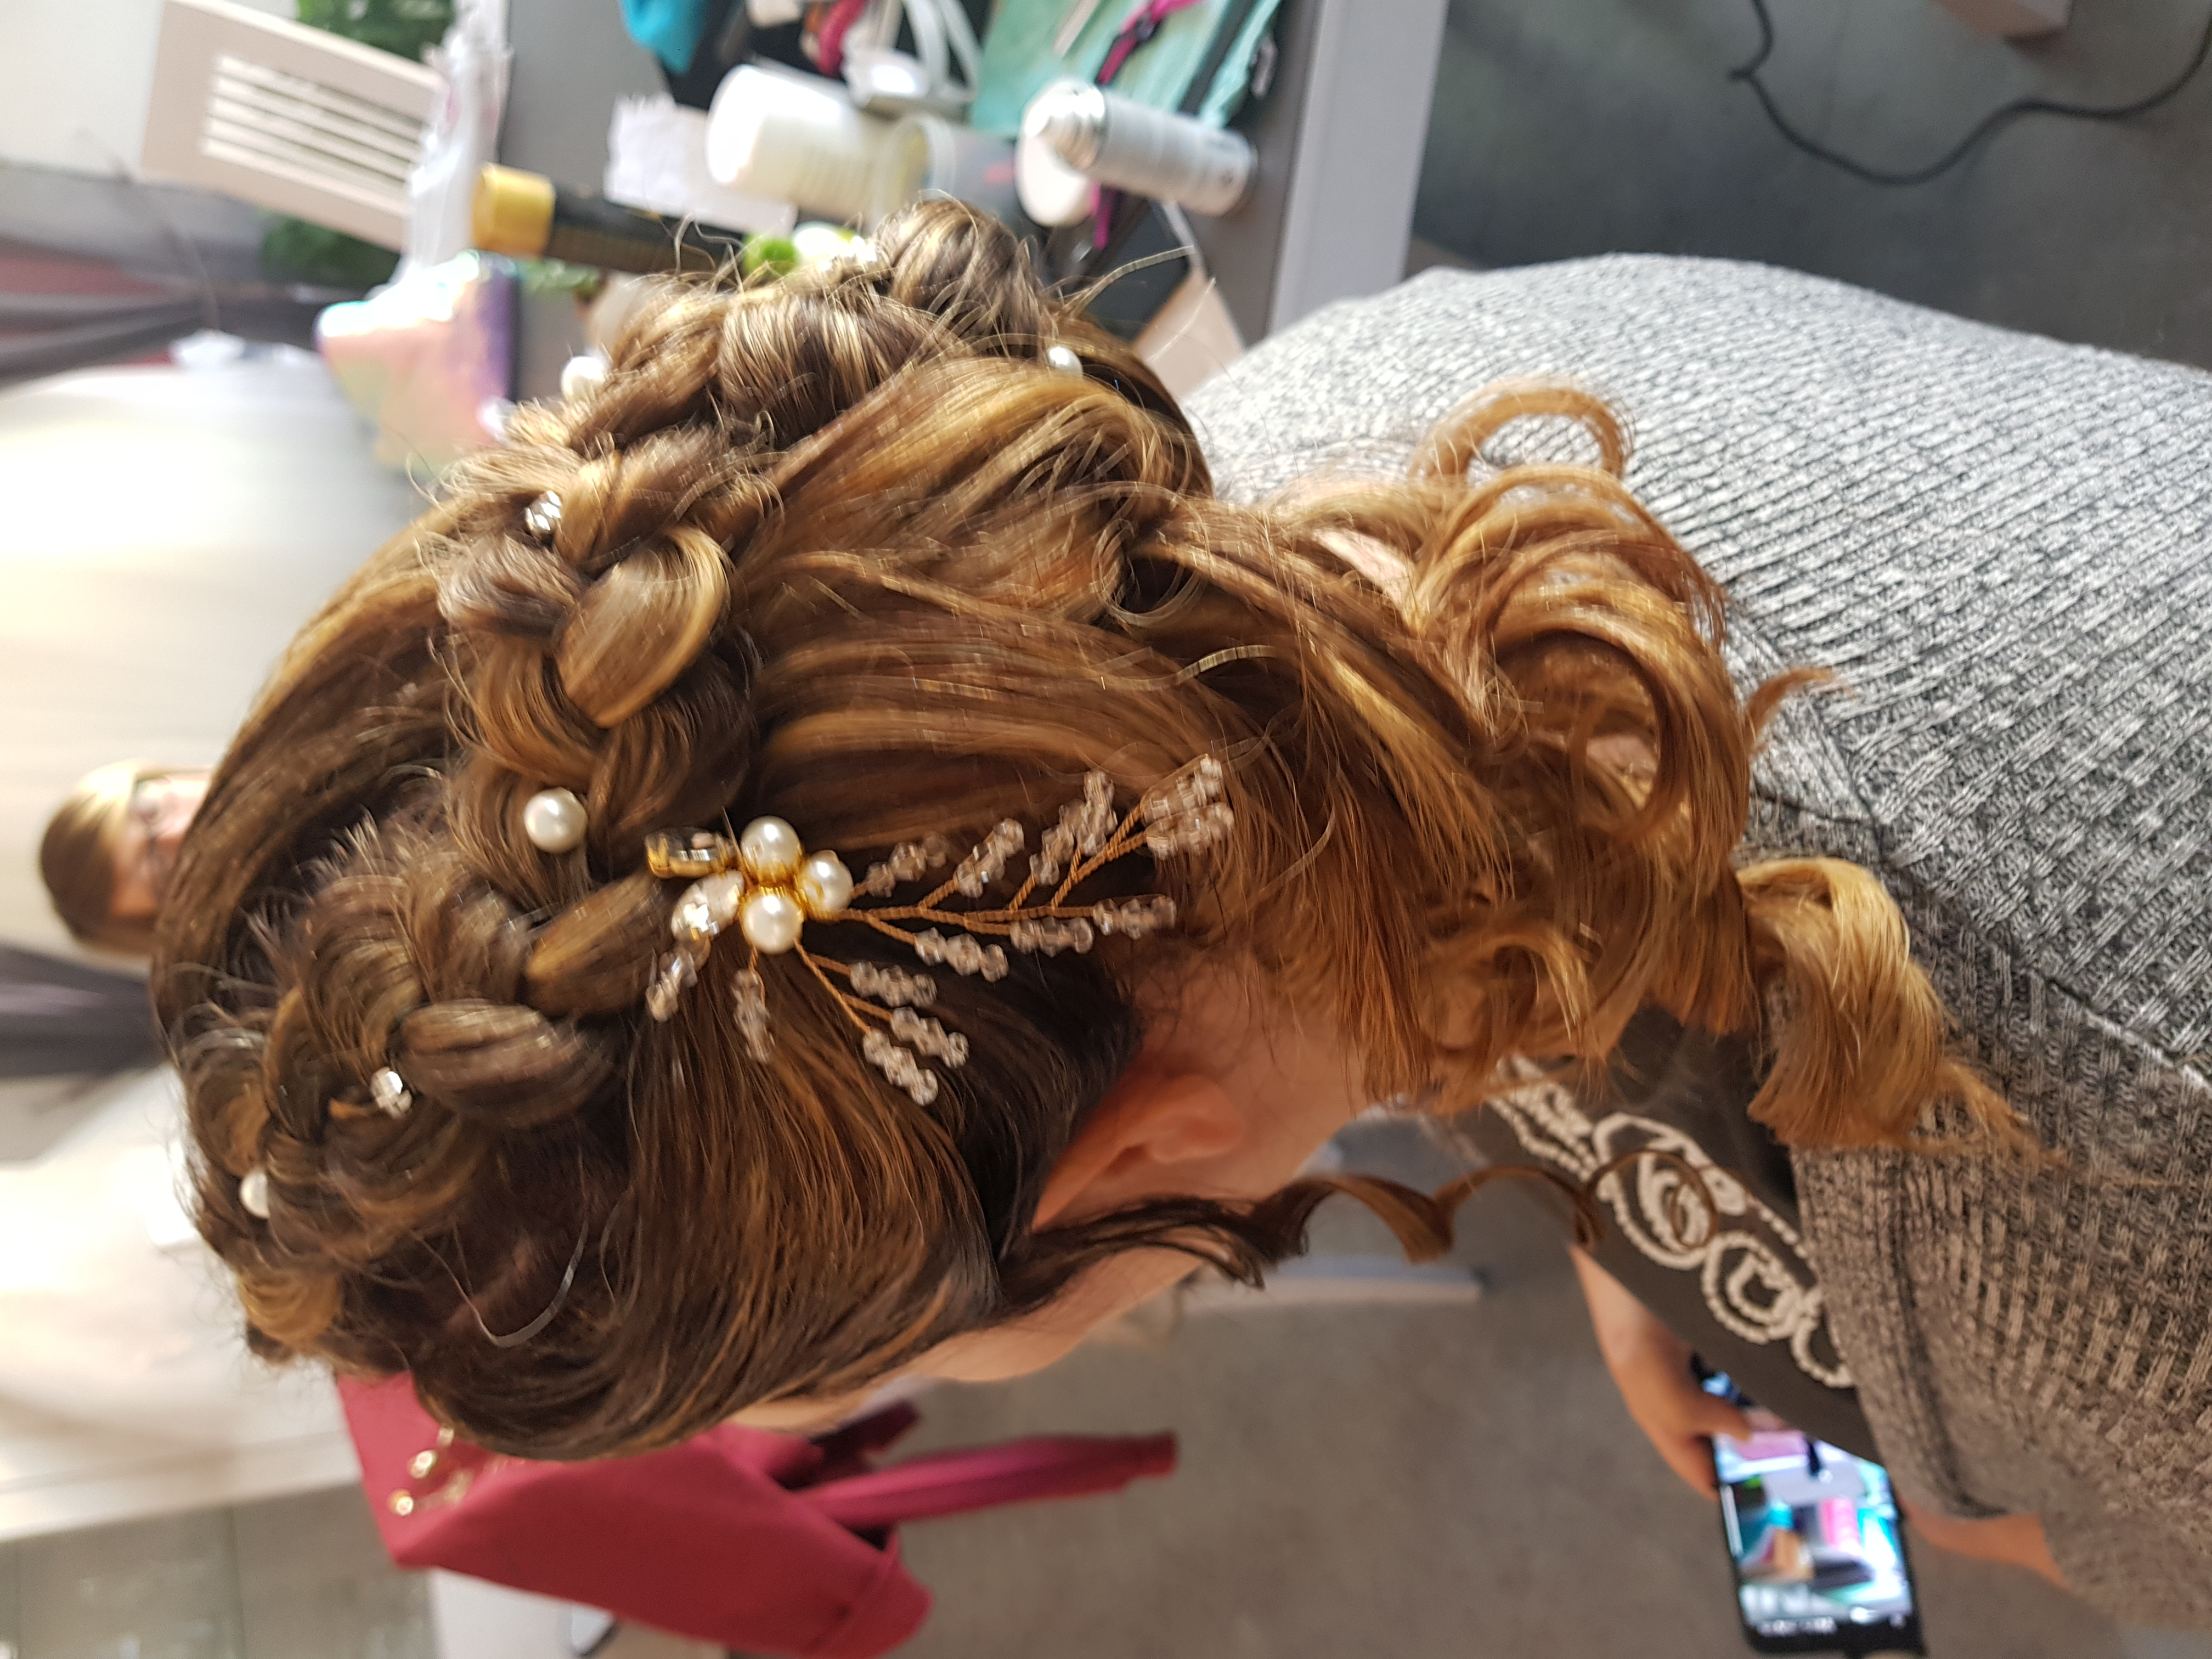 salon de coiffure afro tresse tresses box braids crochet braids vanilles tissages paris 75 77 78 91 92 93 94 95 NNLDZJAR